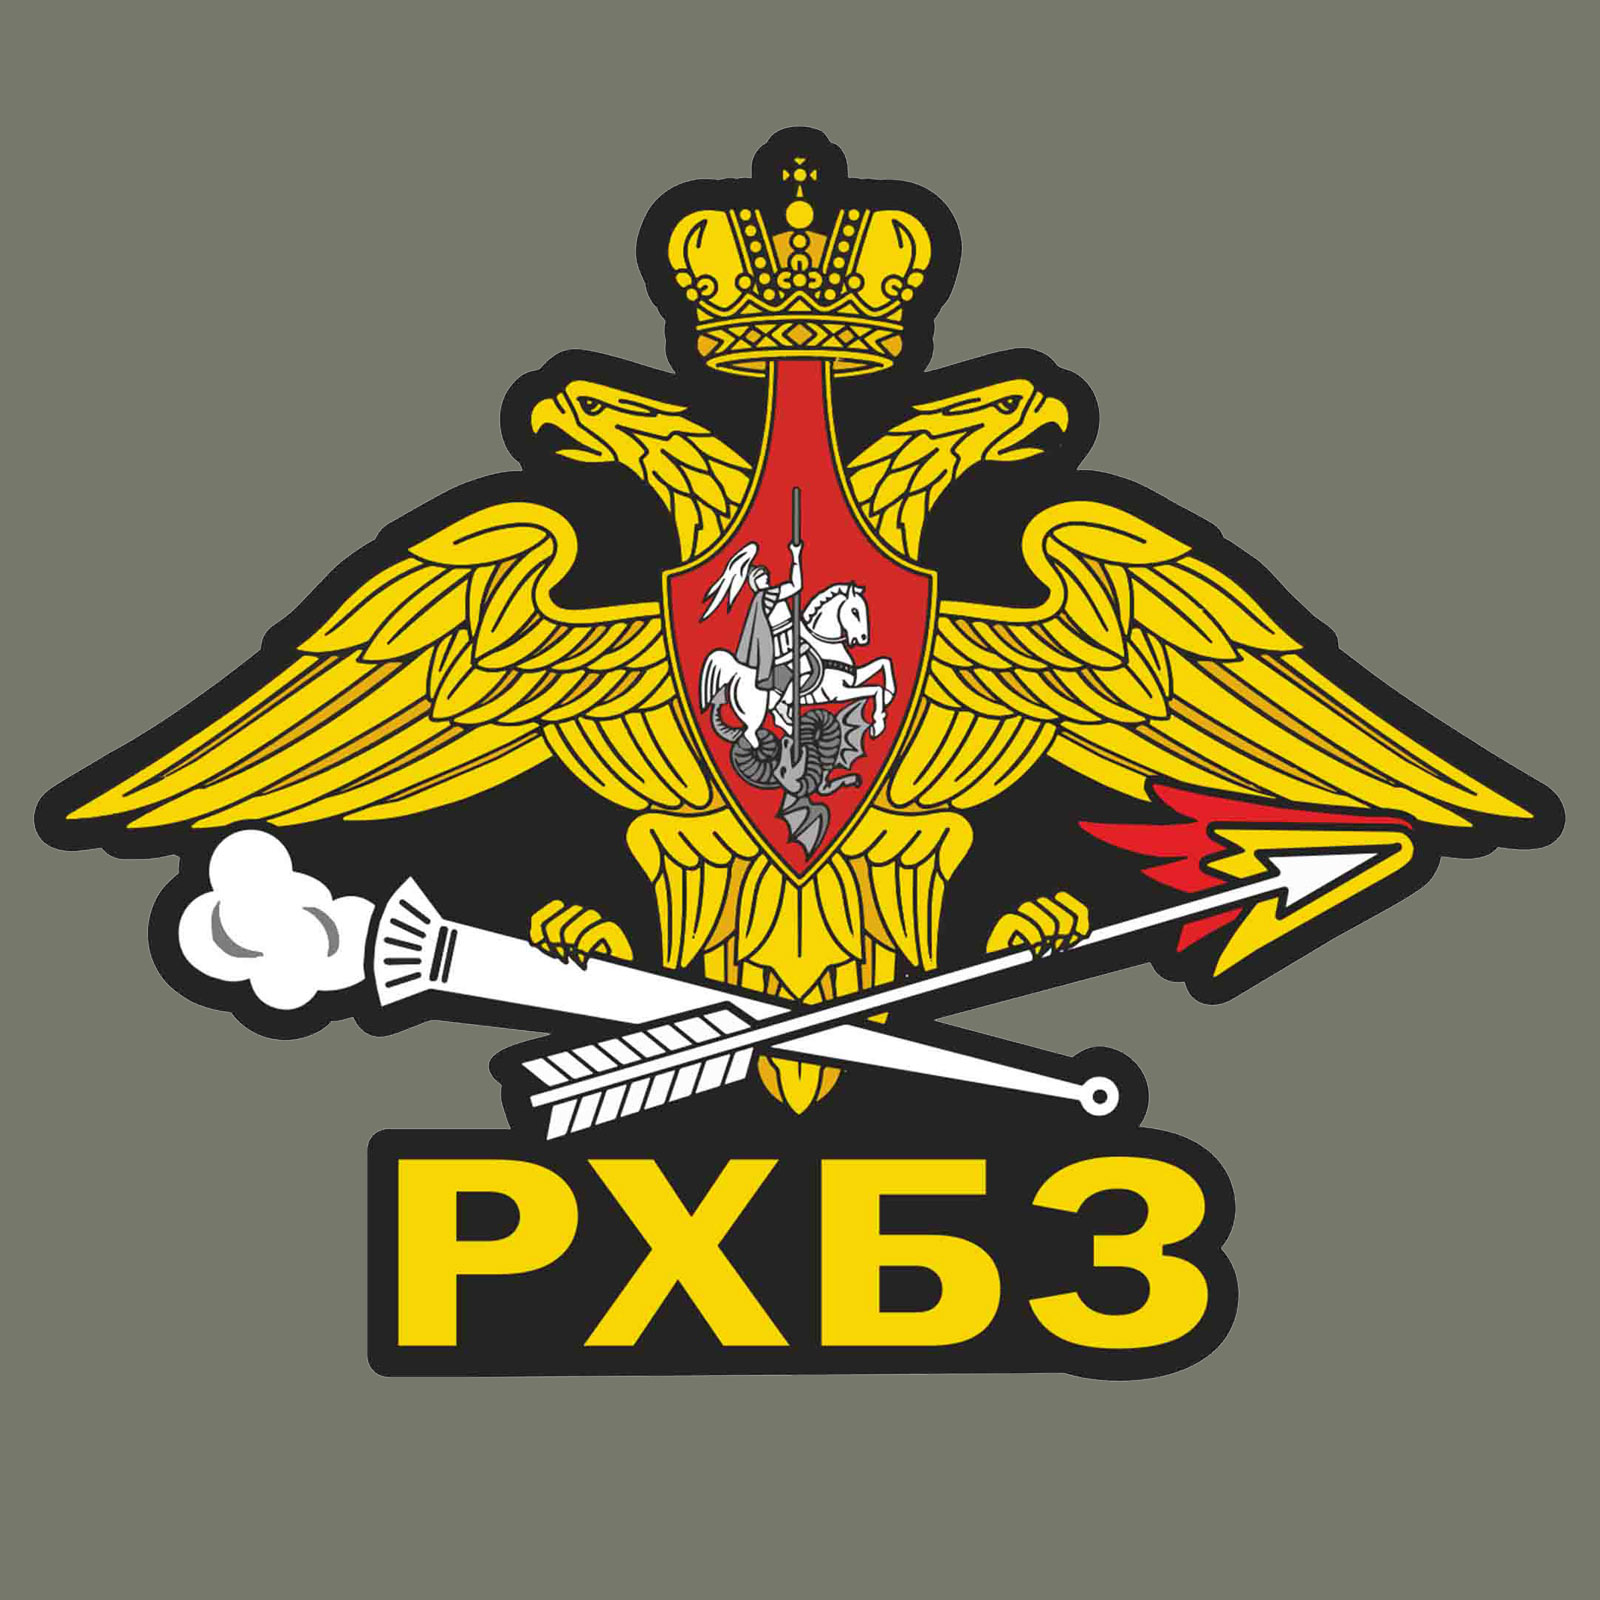 Армейская футболка РХБЗ с вышивкой на груди - от Военпро